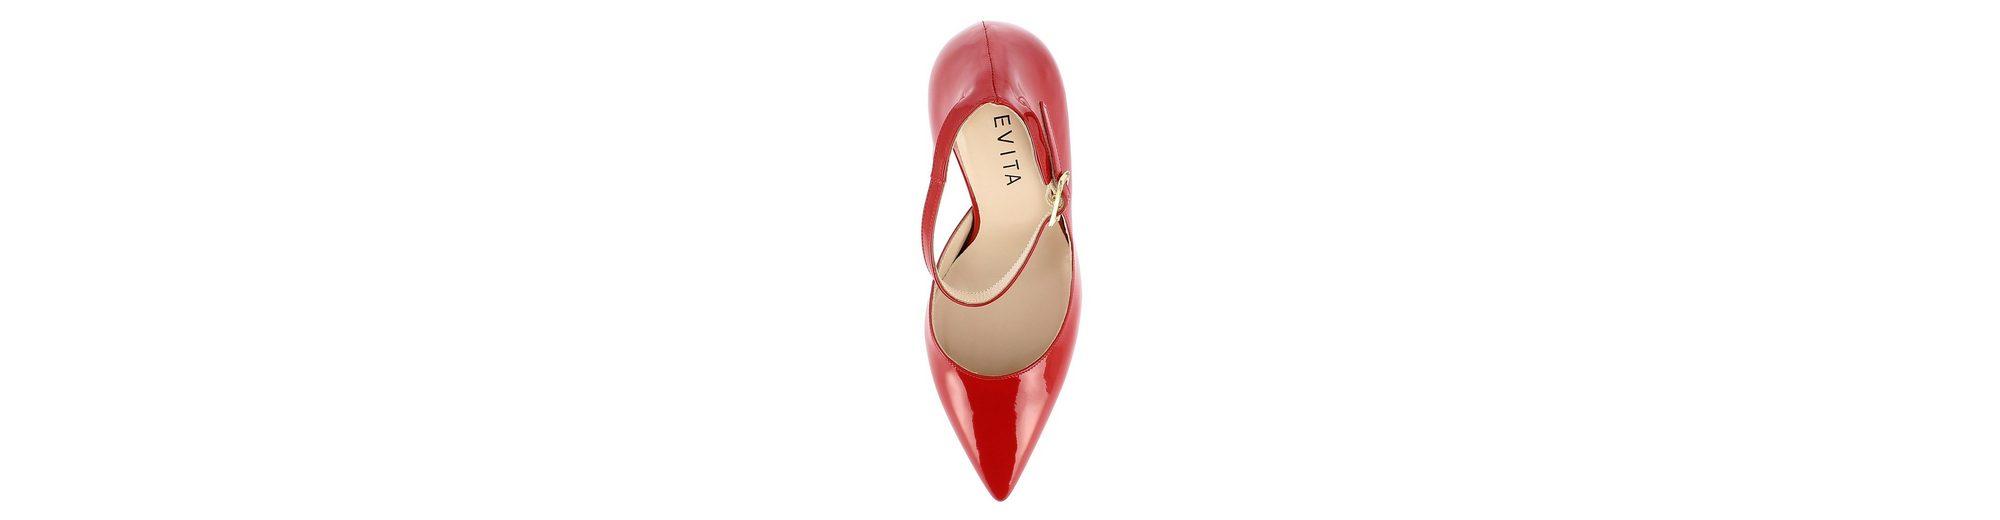 Evita ALINA High-Heel-Pumps Steckdose Mit Paypal aqrfe